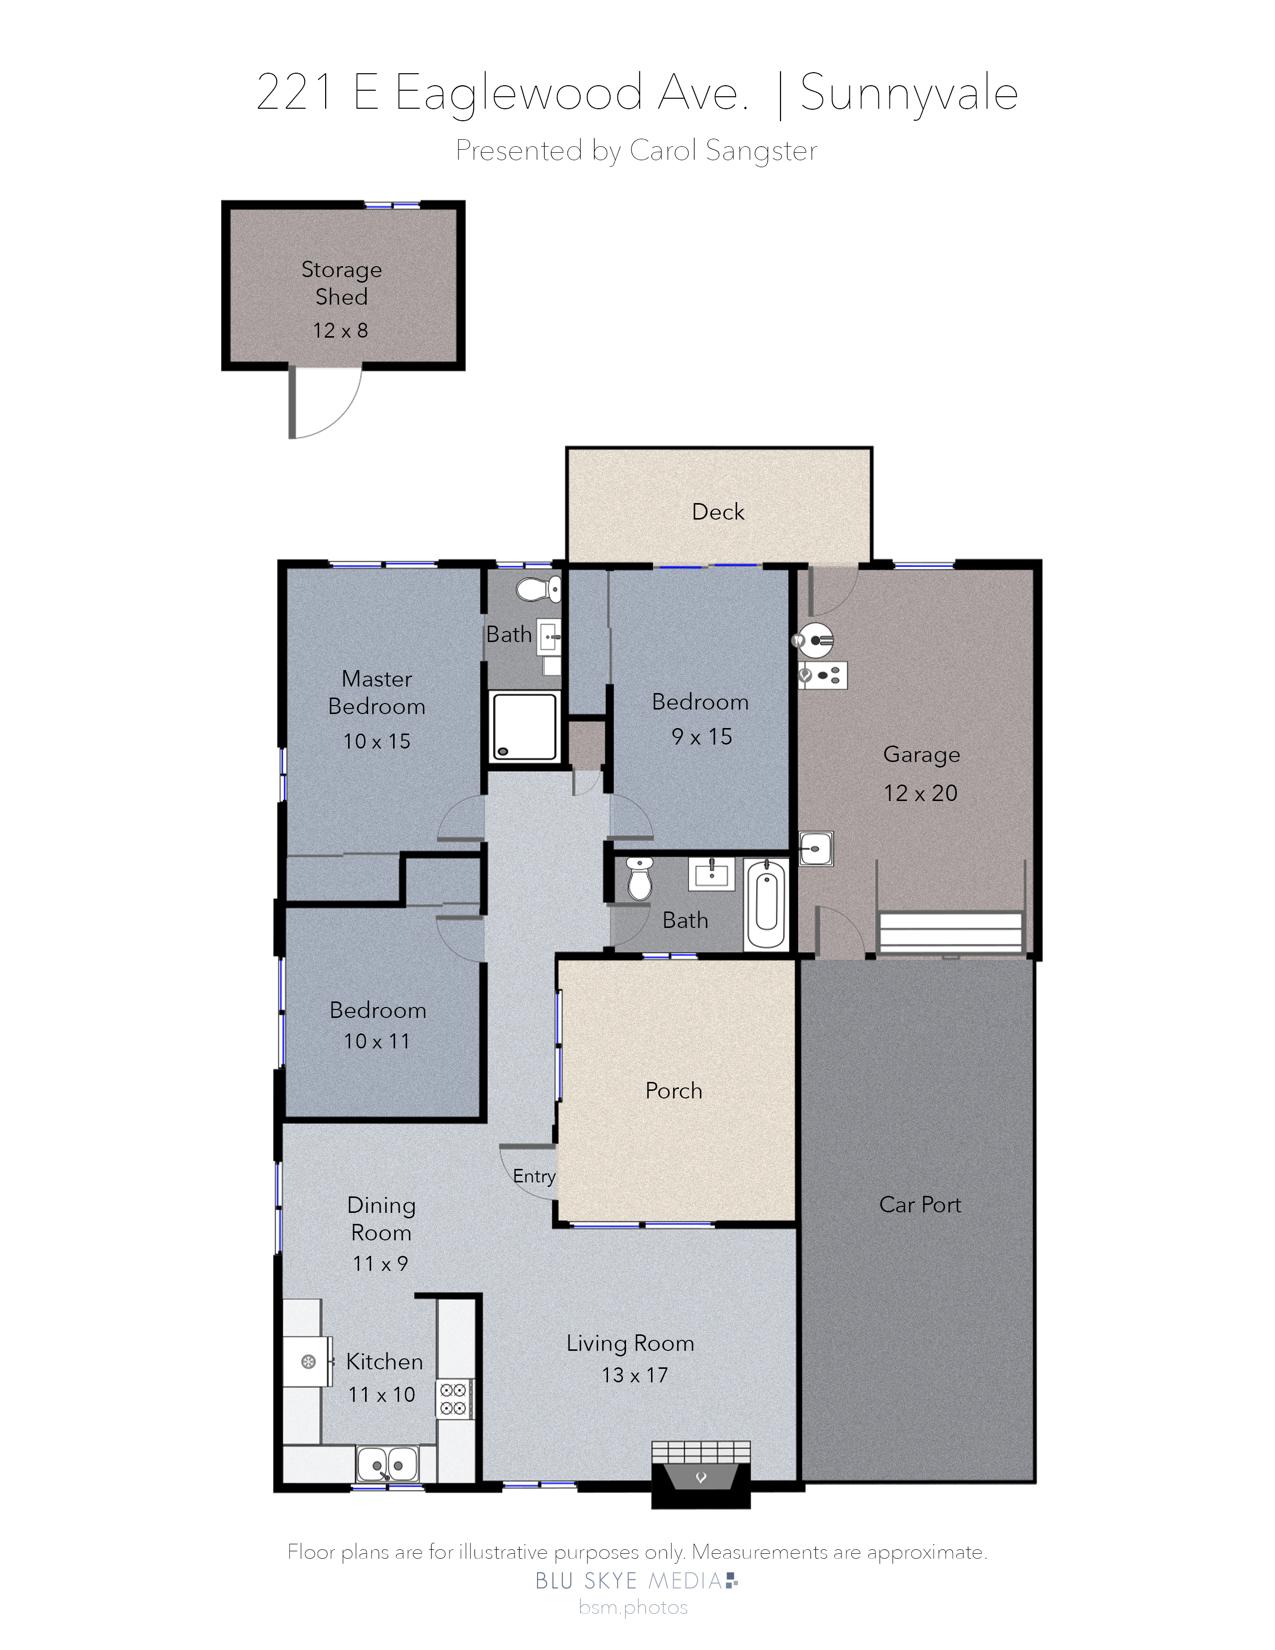 221 E Eaglewood Floor Plan.jpg